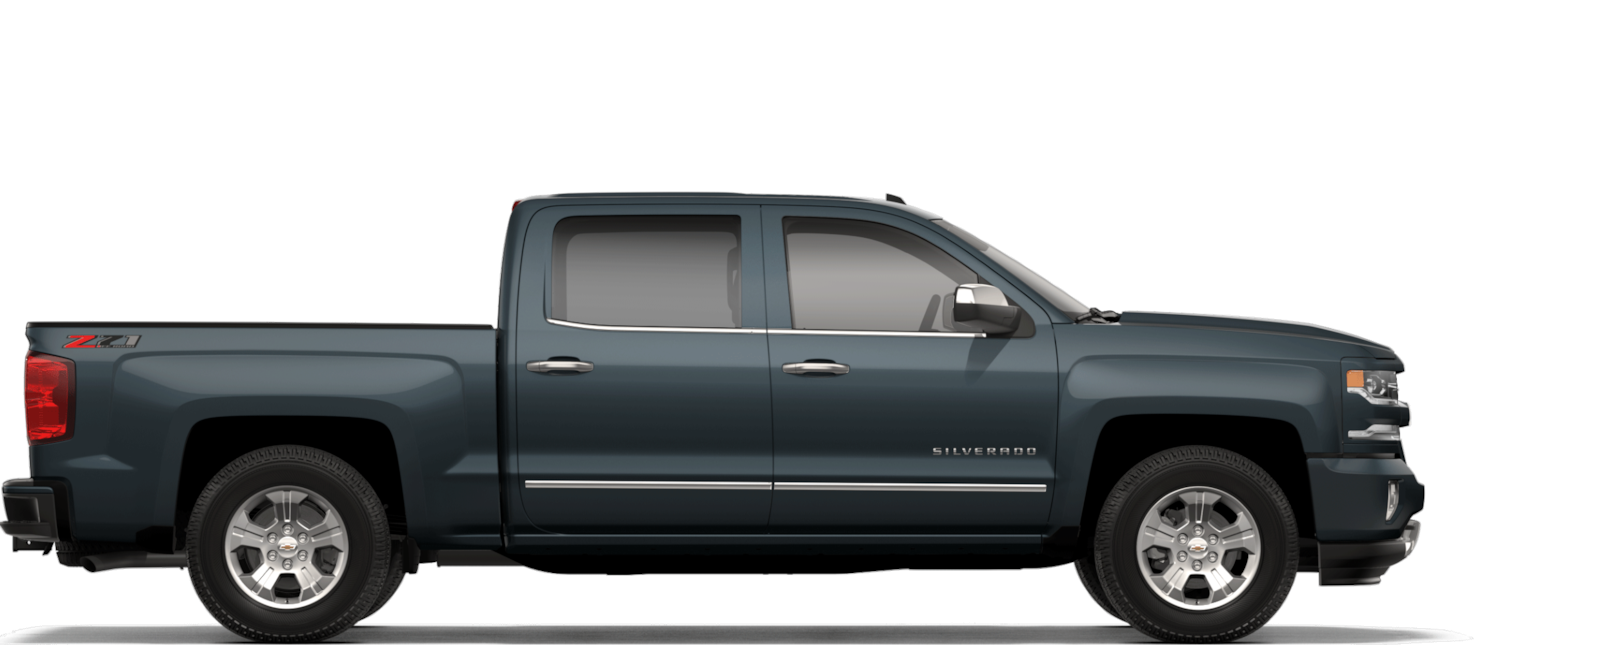 2018 Silverado 1500 Pickup Truck Chevrolet 2015 Camper Wiring Diagram